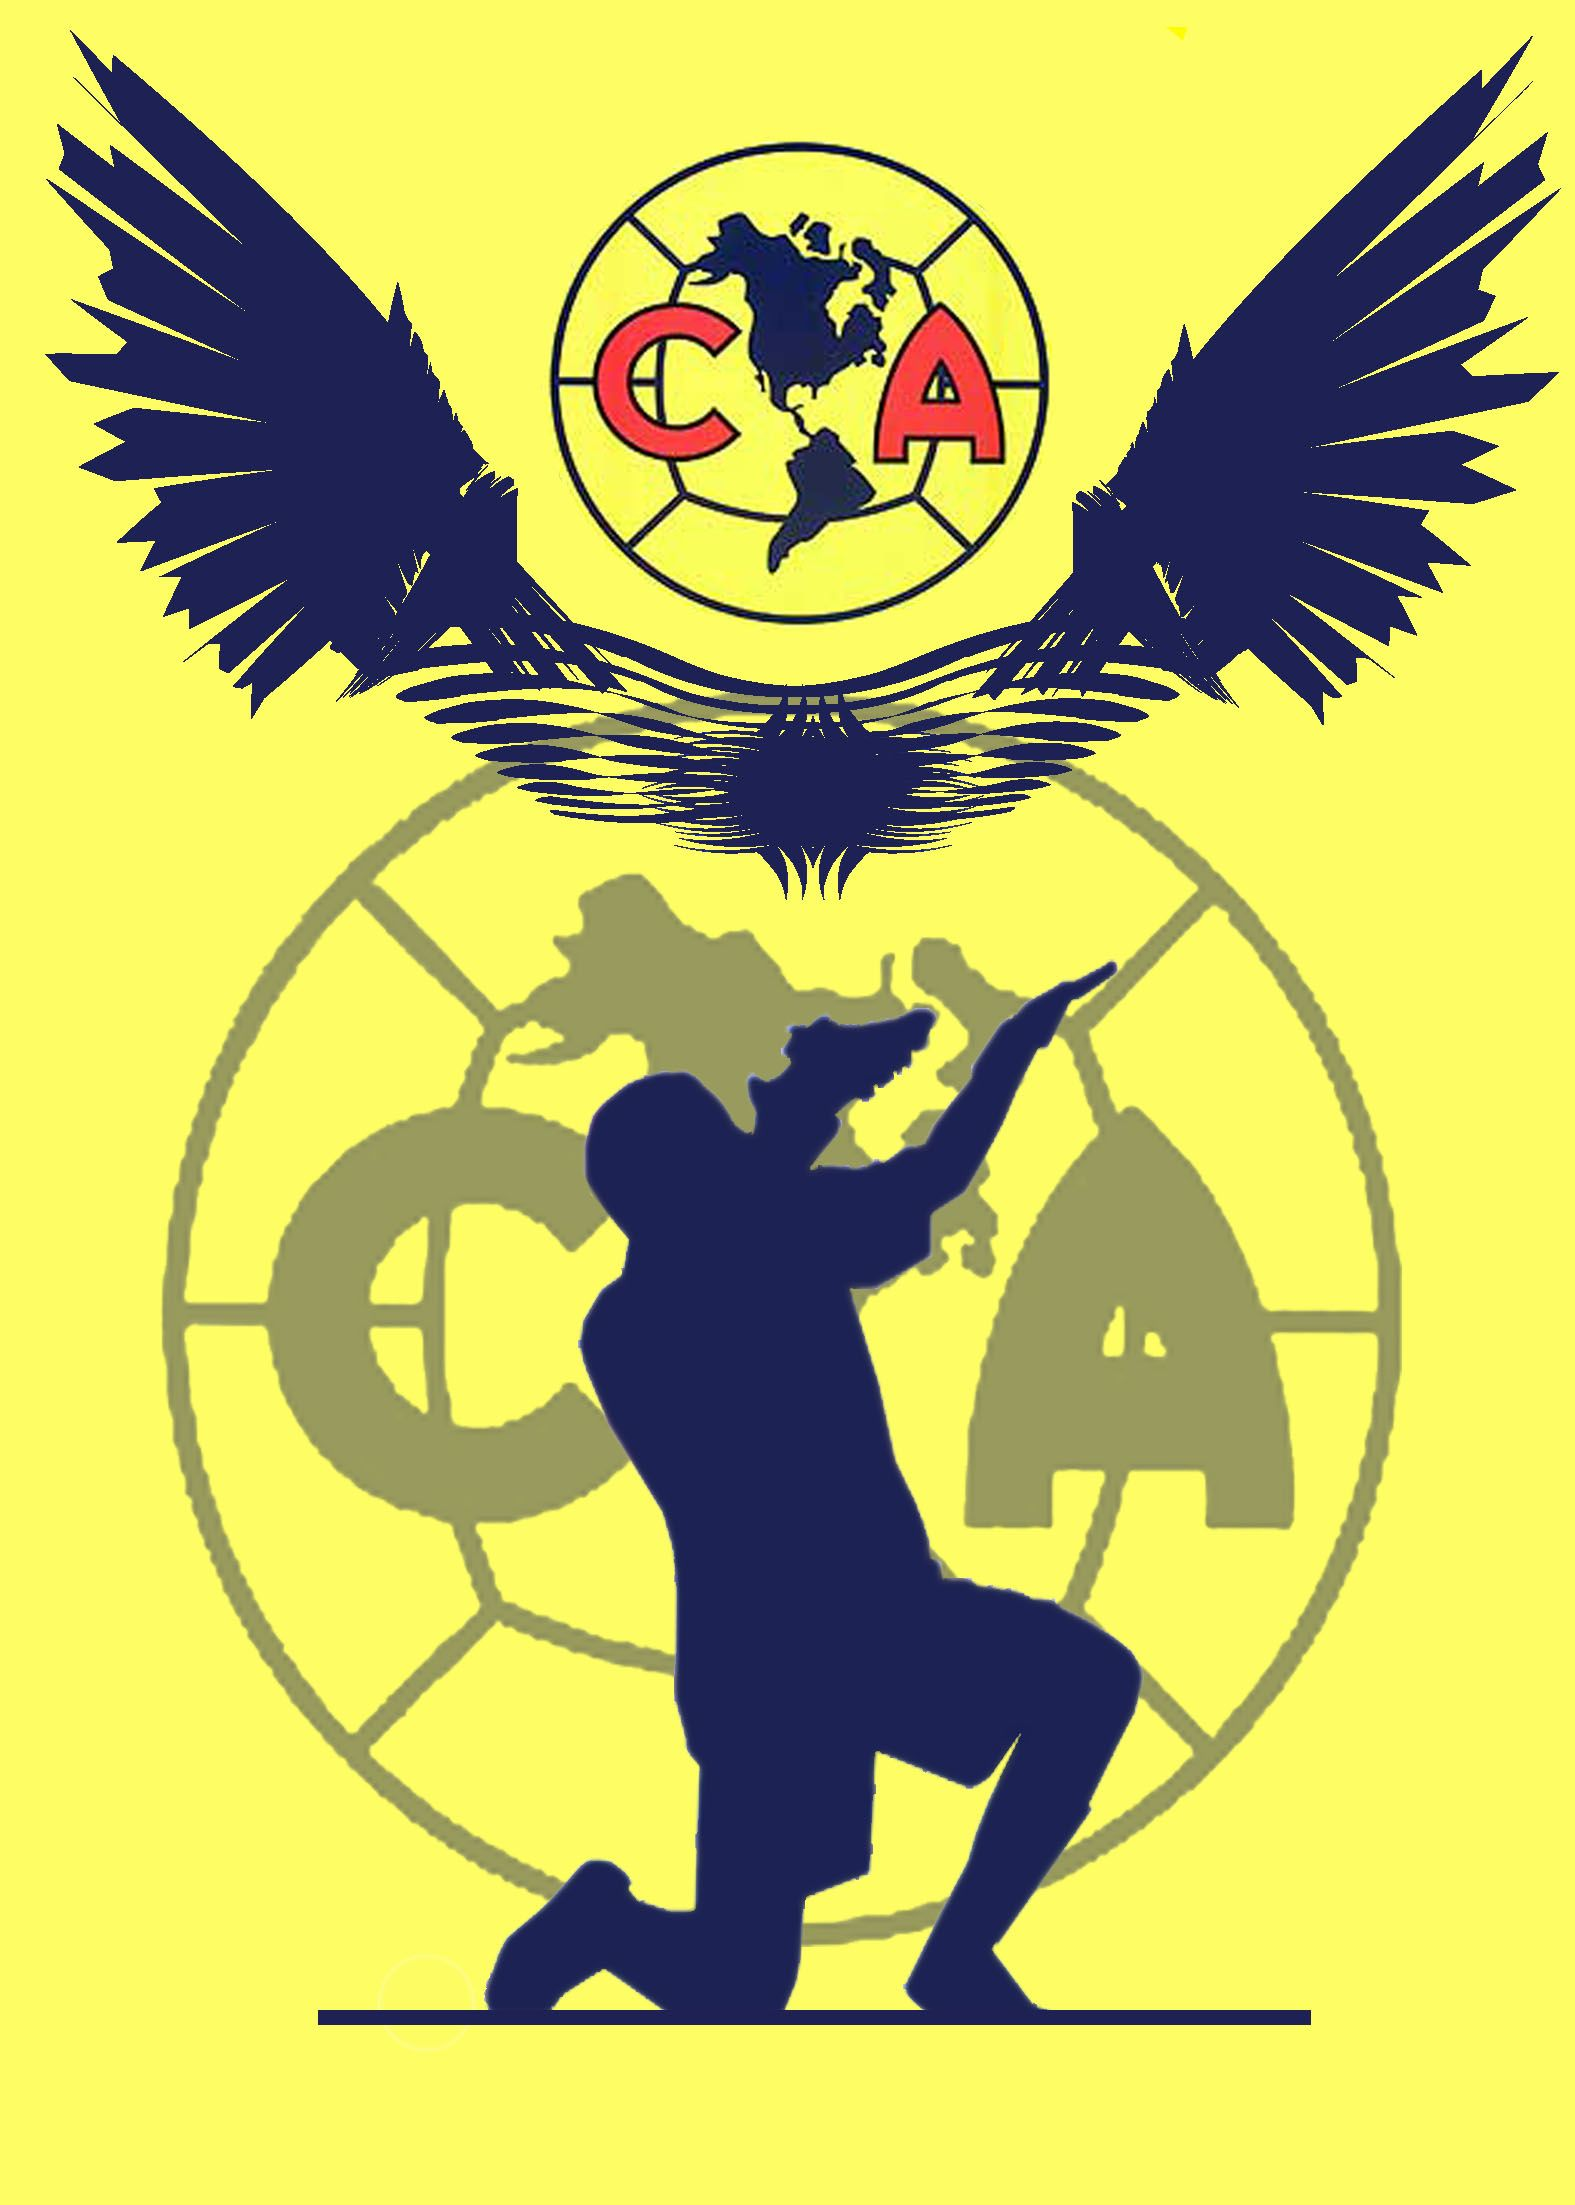 Vamos America Club America Club De Futbol America America Equipo